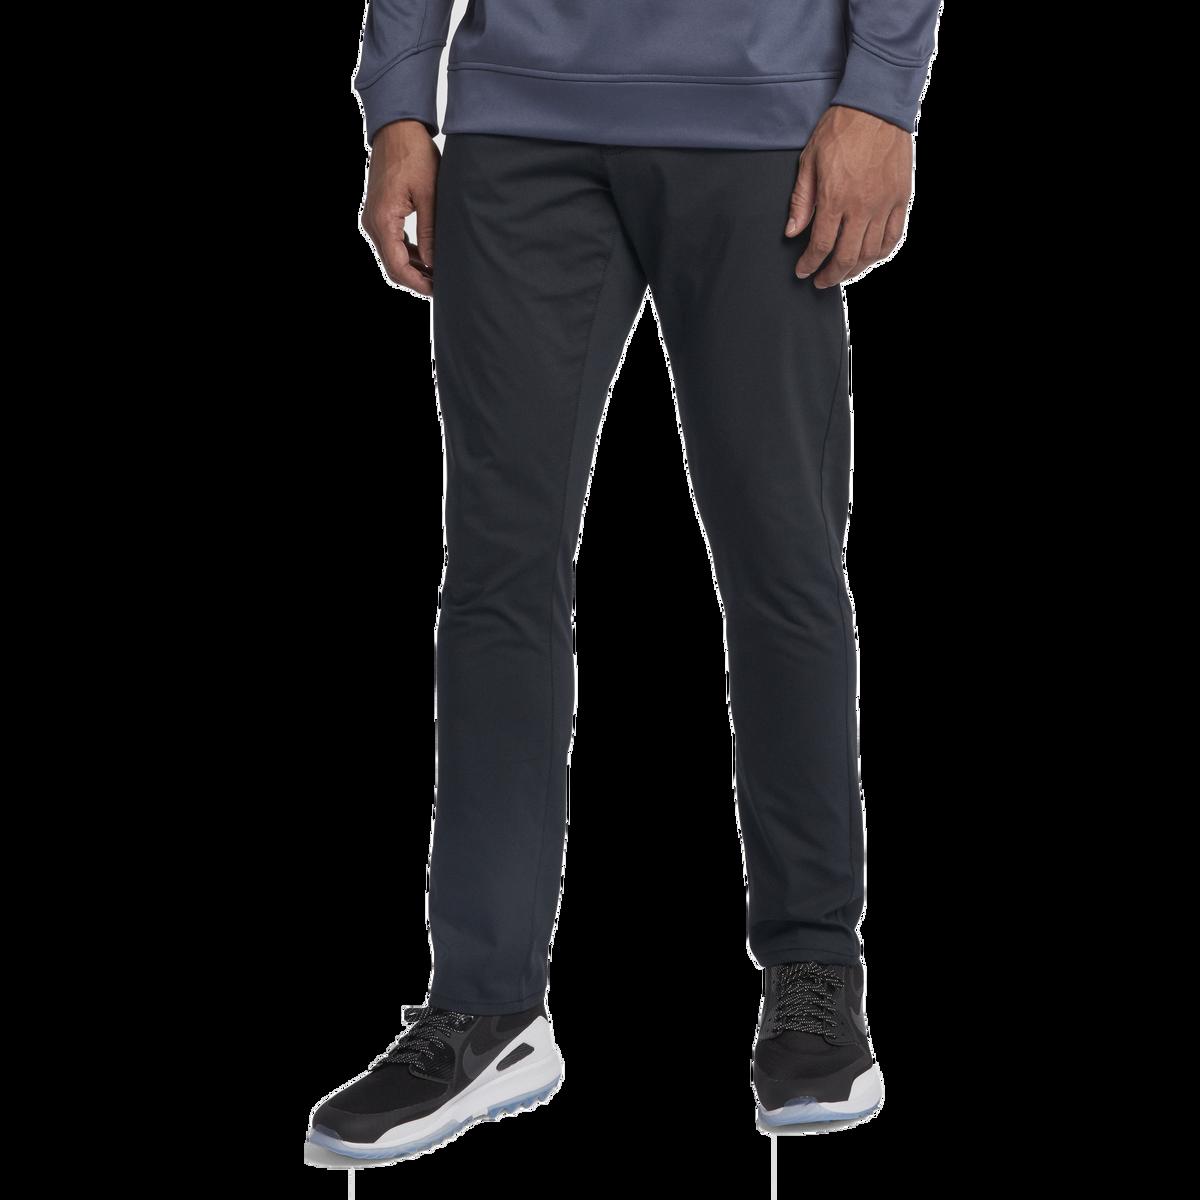 25cf56d5163ca Nike Flex Slim Golf Pant